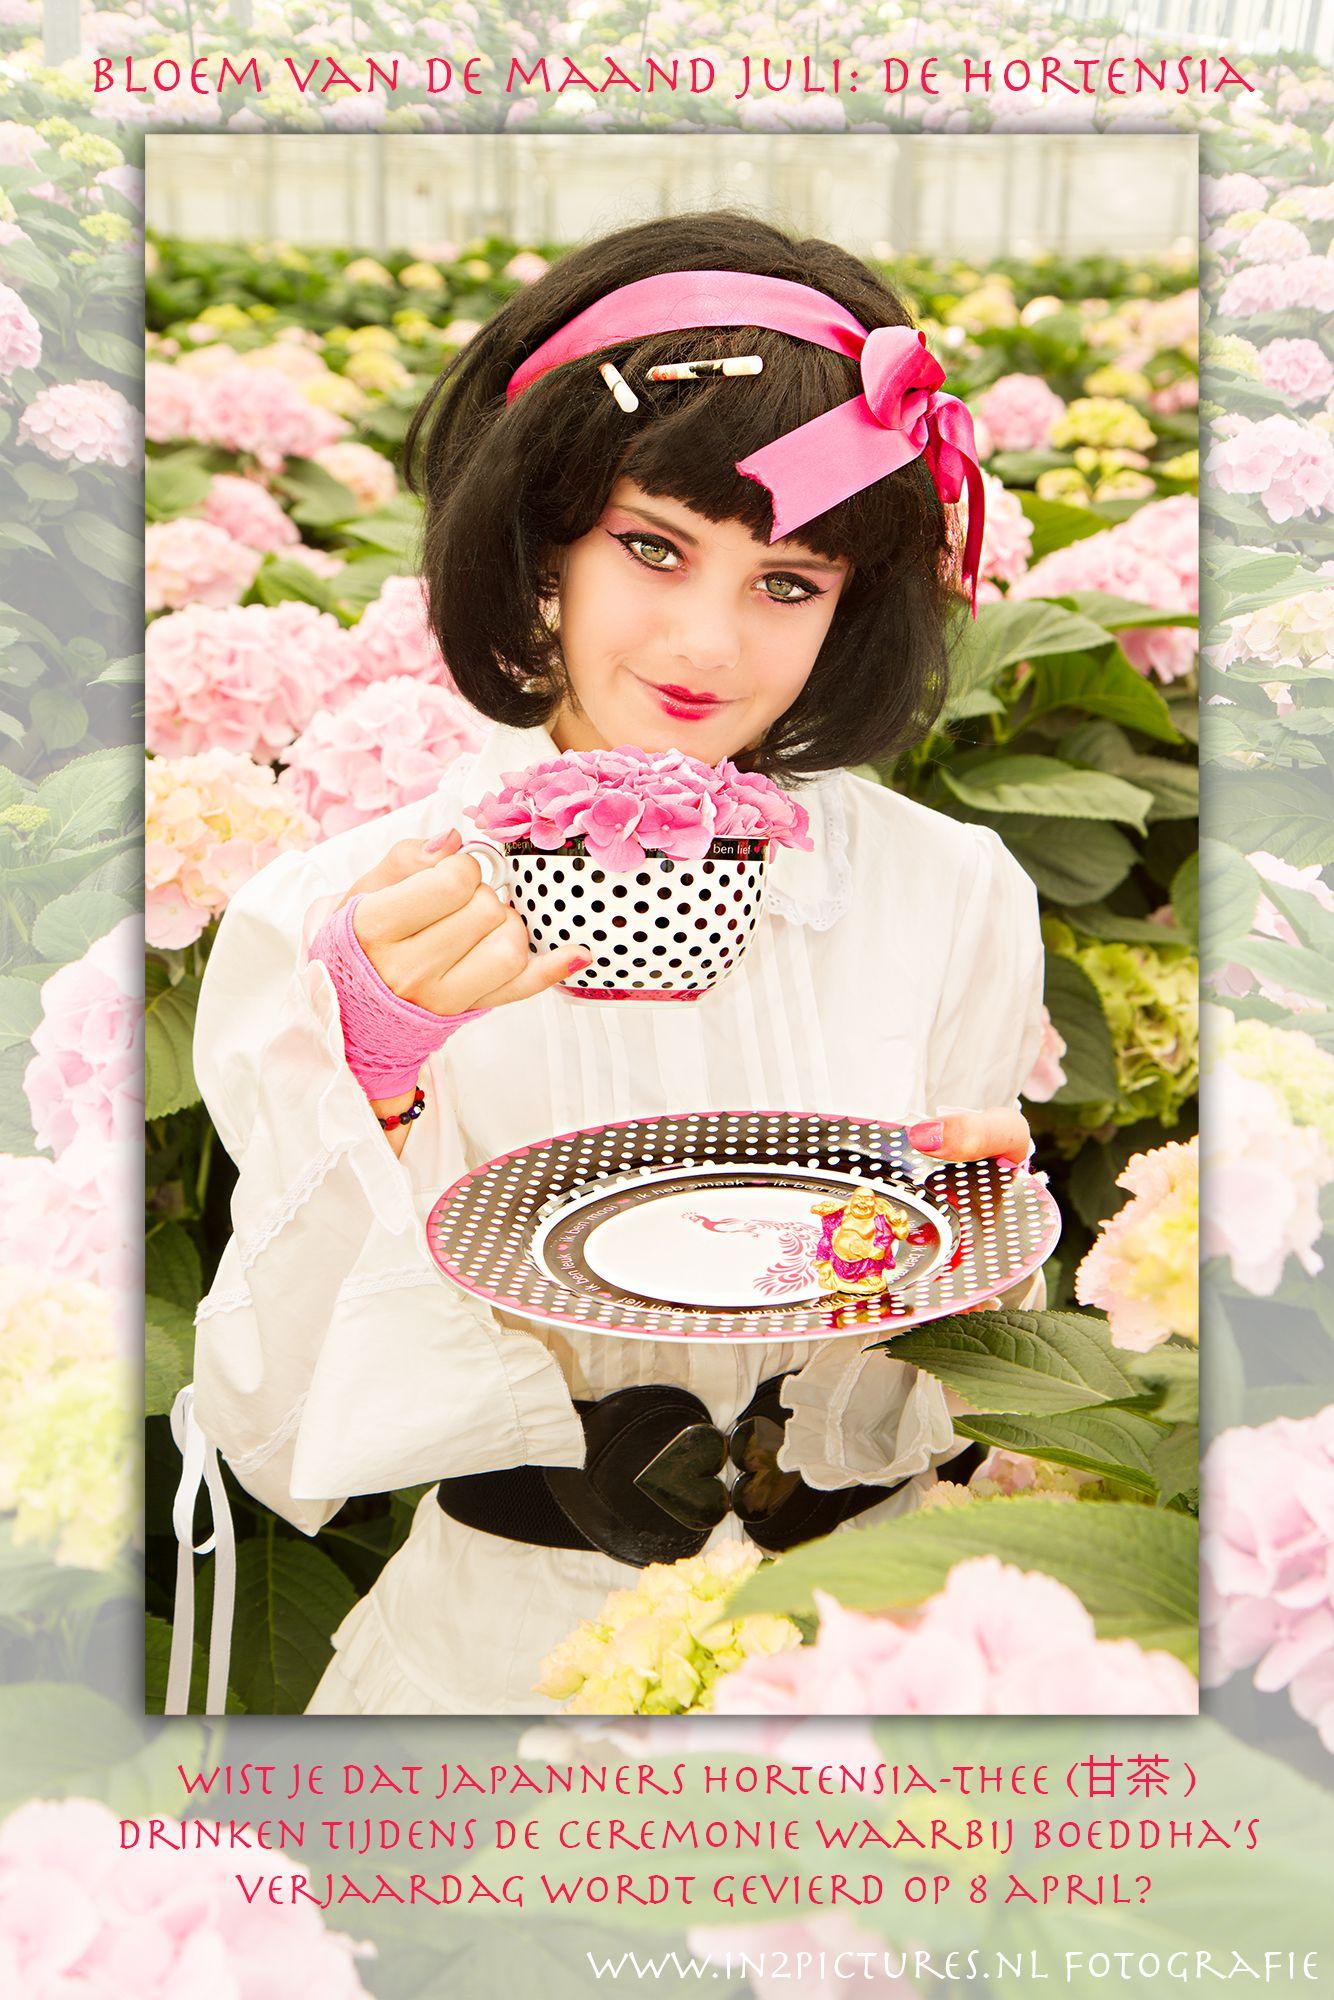 Hydrangea... in Japan people drink tea made of hydrangea's on the birthday of Buddha